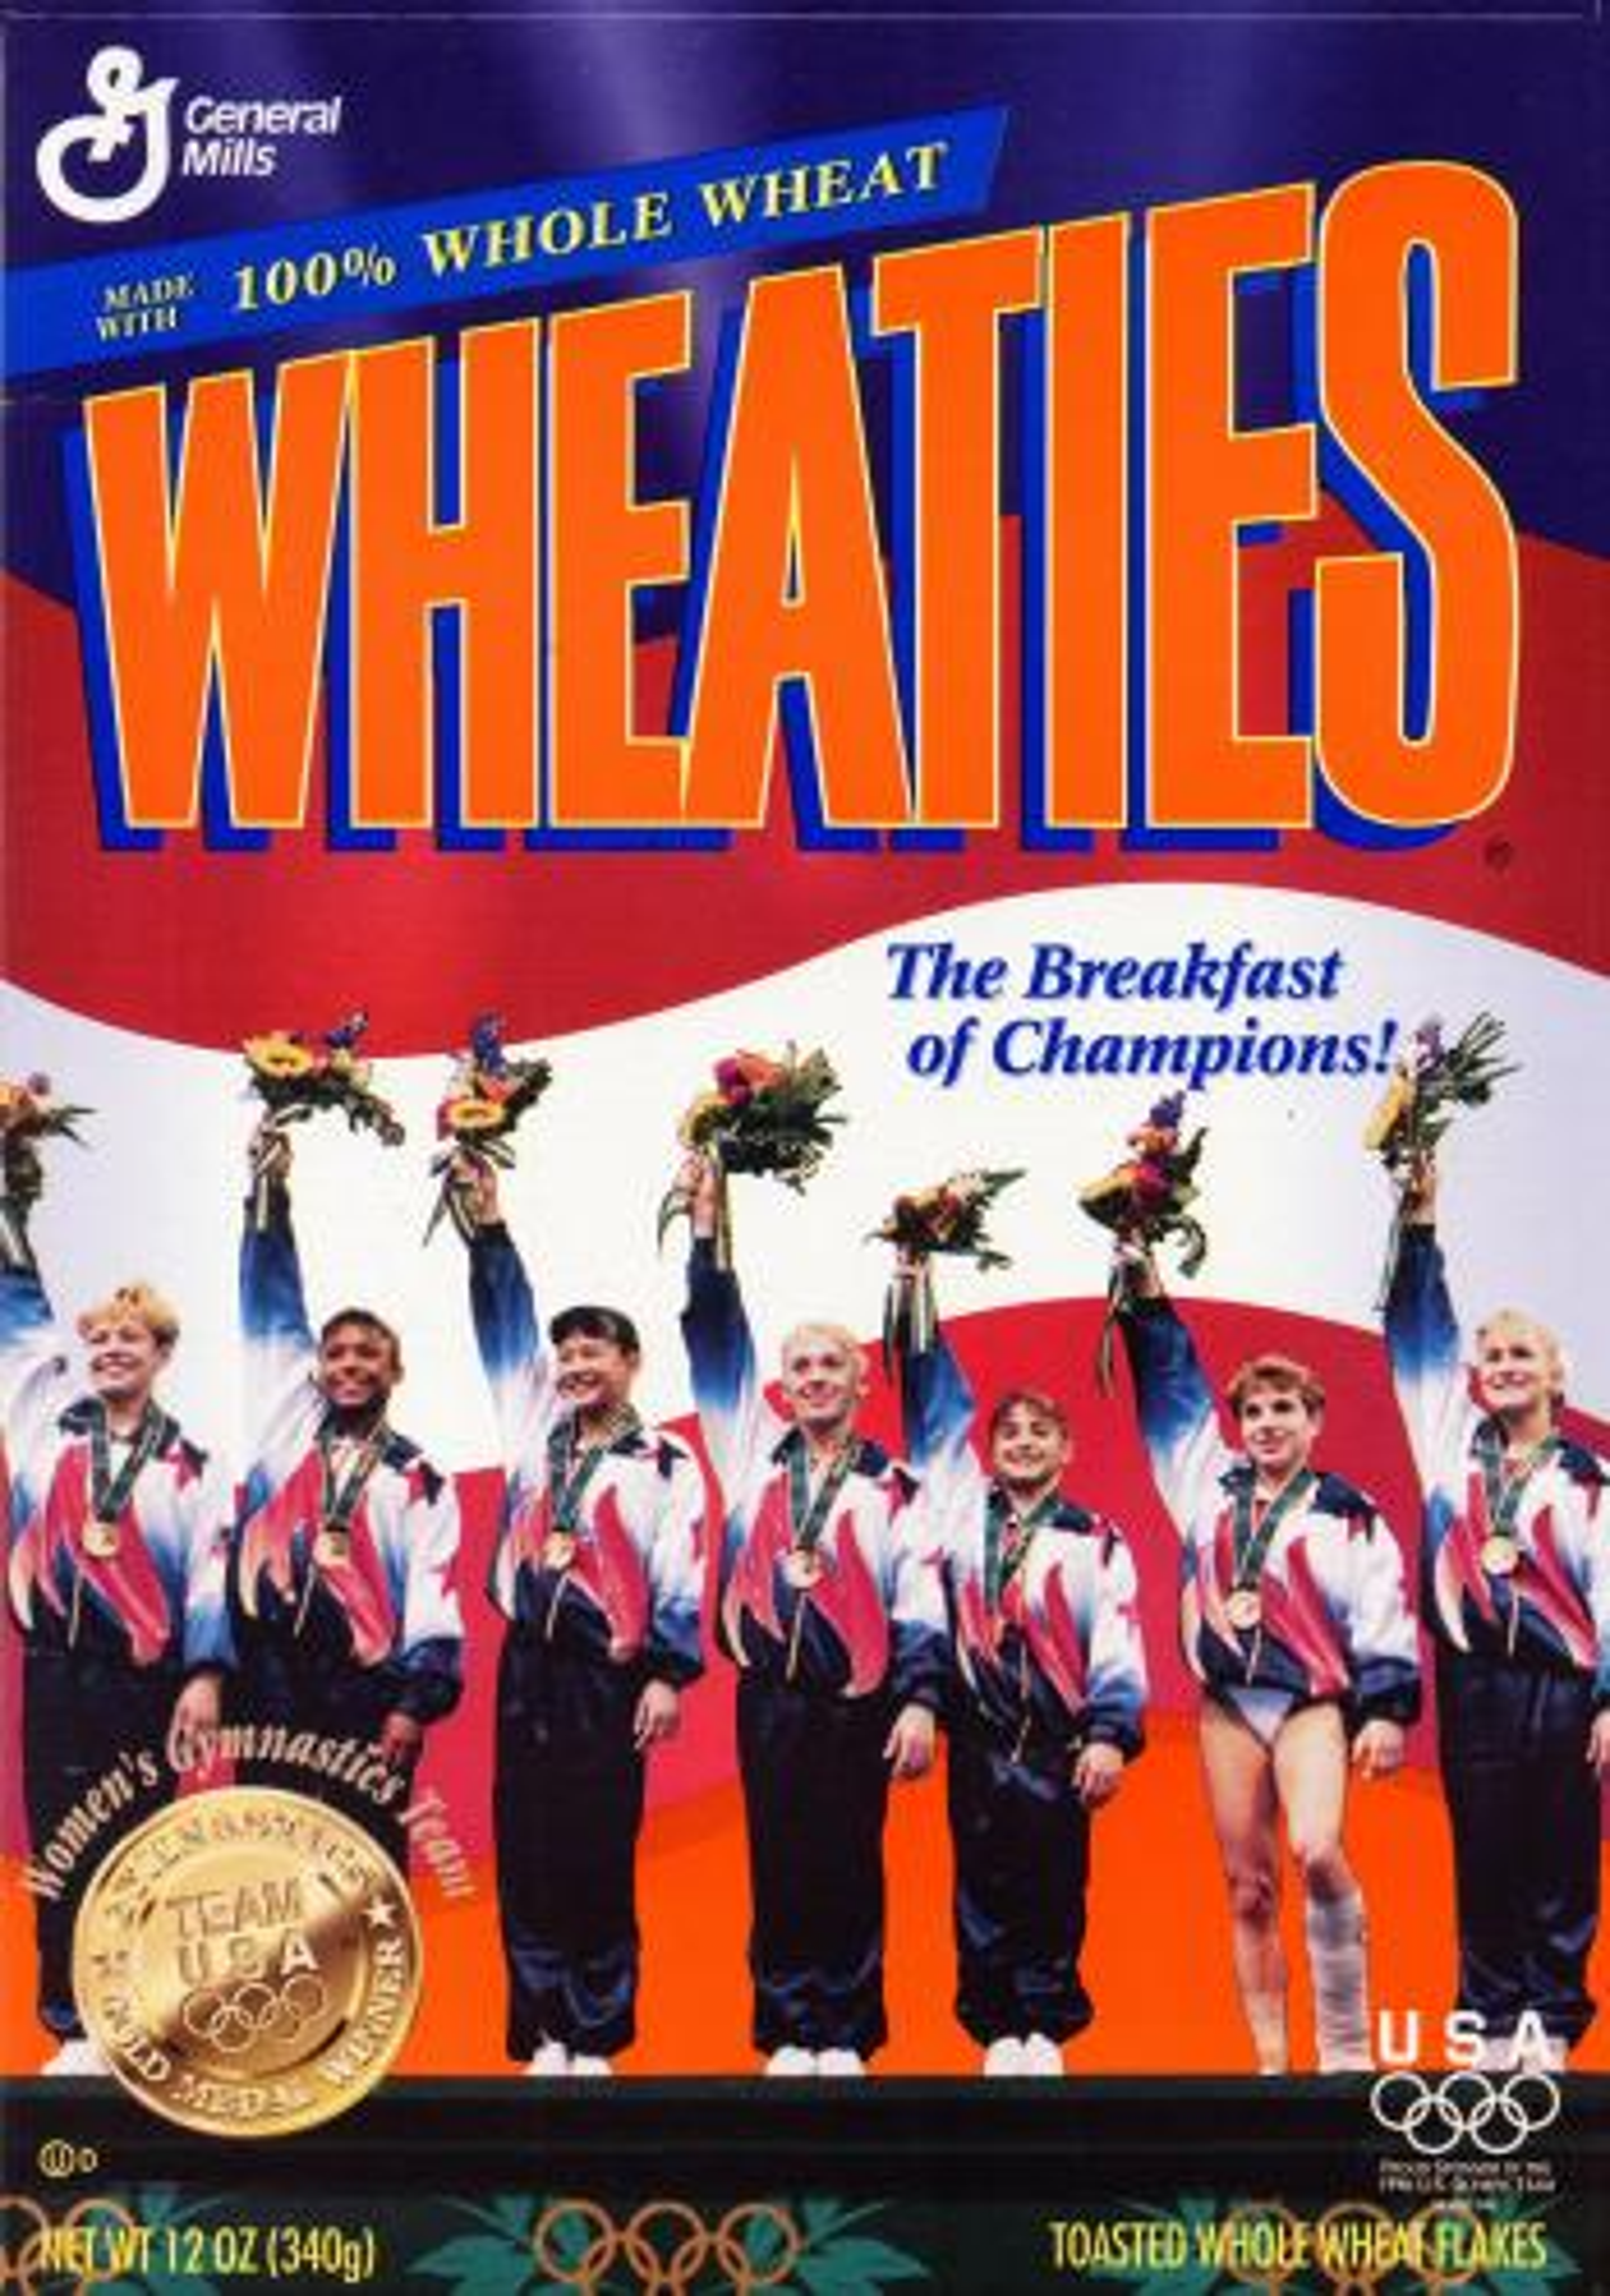 The US Women's Gymnastics team on the Wheaties box.